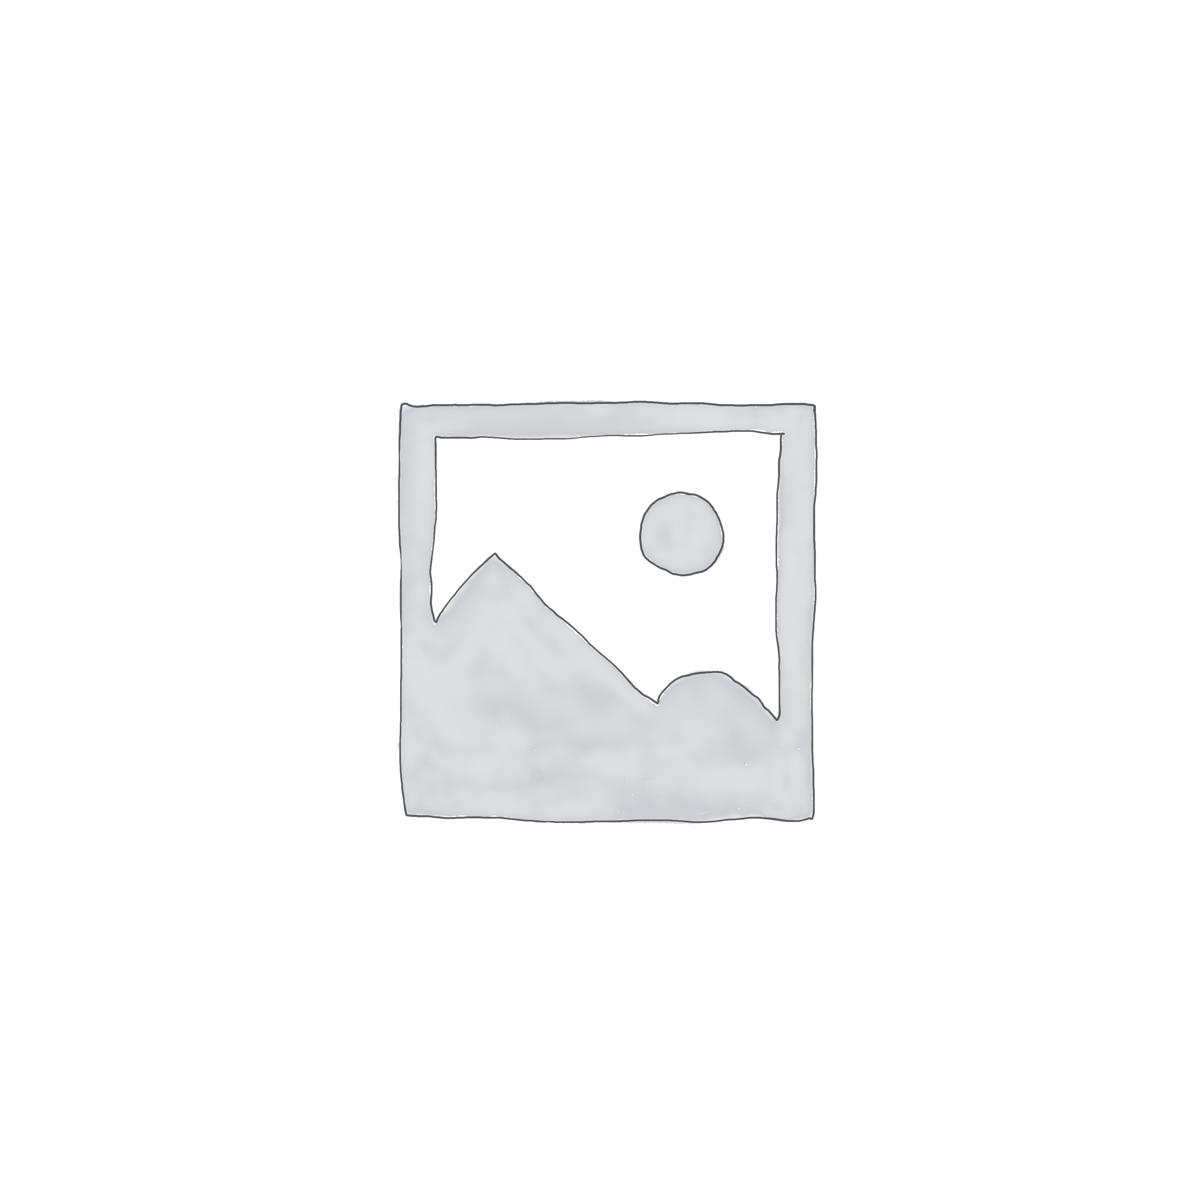 Roka 01 Alkossegyedit